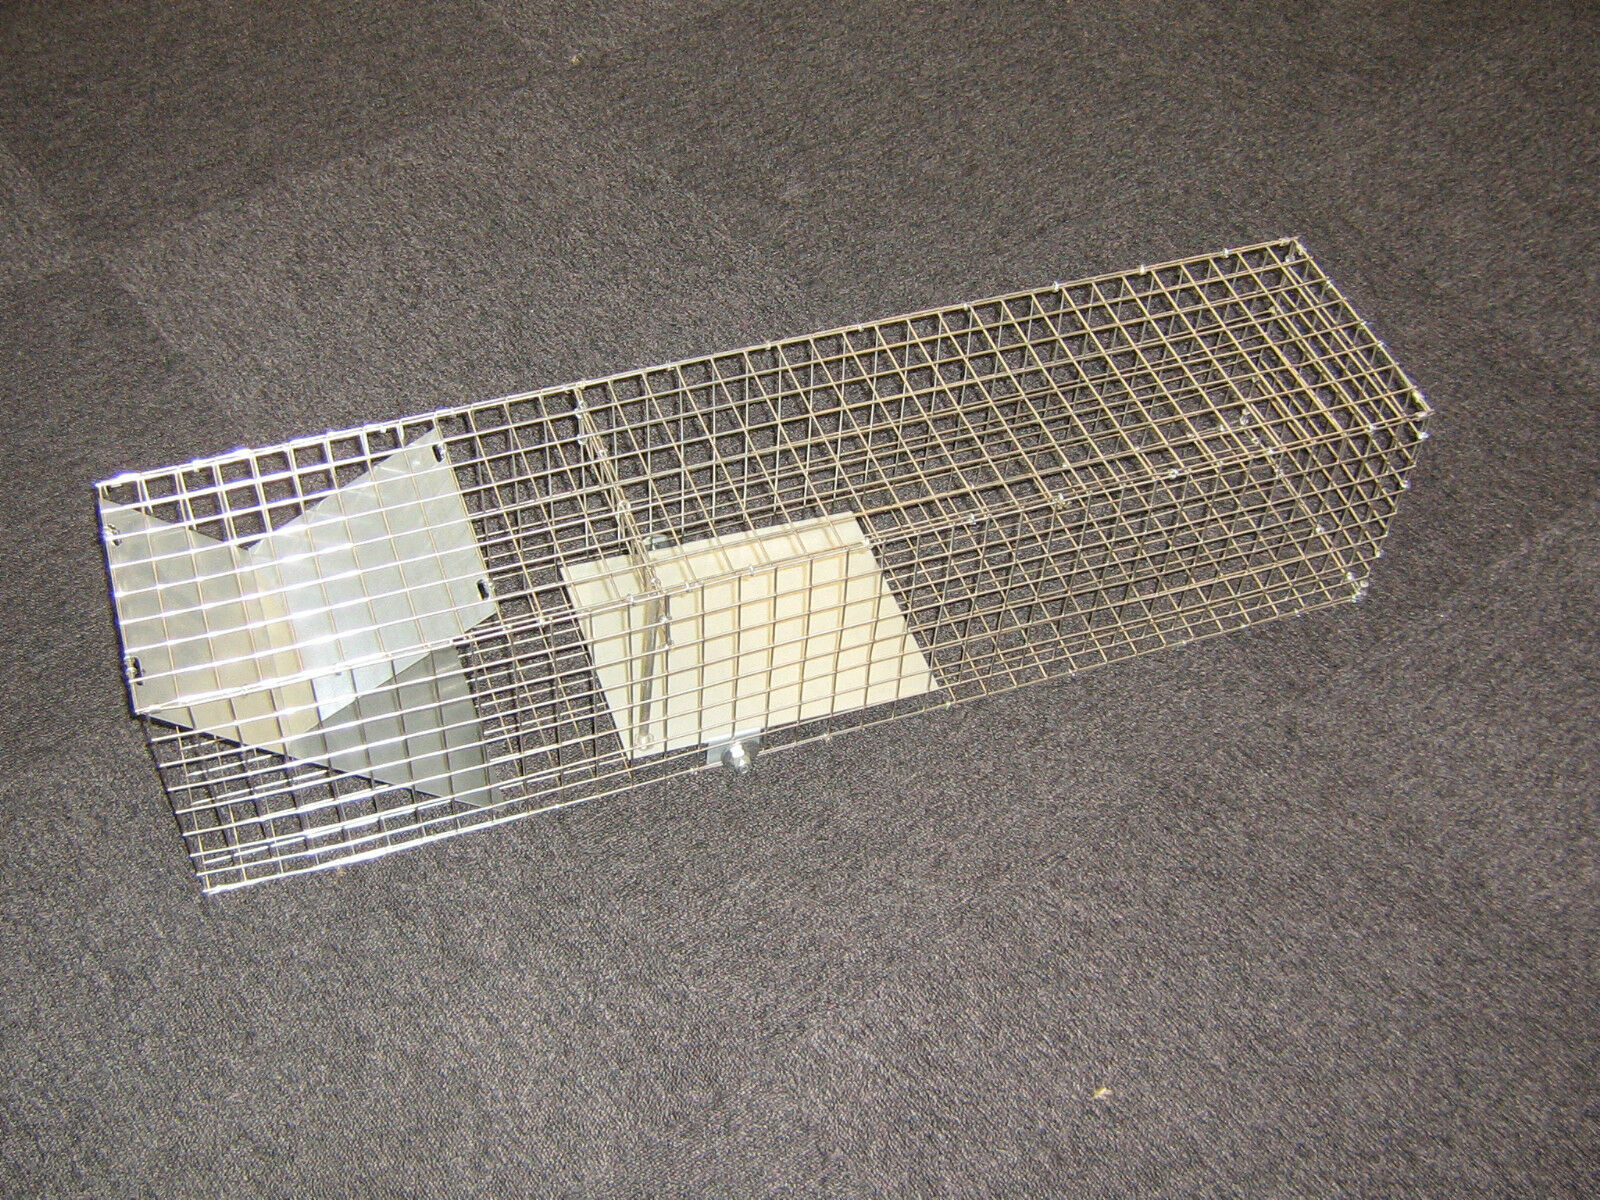 Marderfalle lebendfalle gatos trampa de alambre caso caja Trampa trampa-acero inoxidable